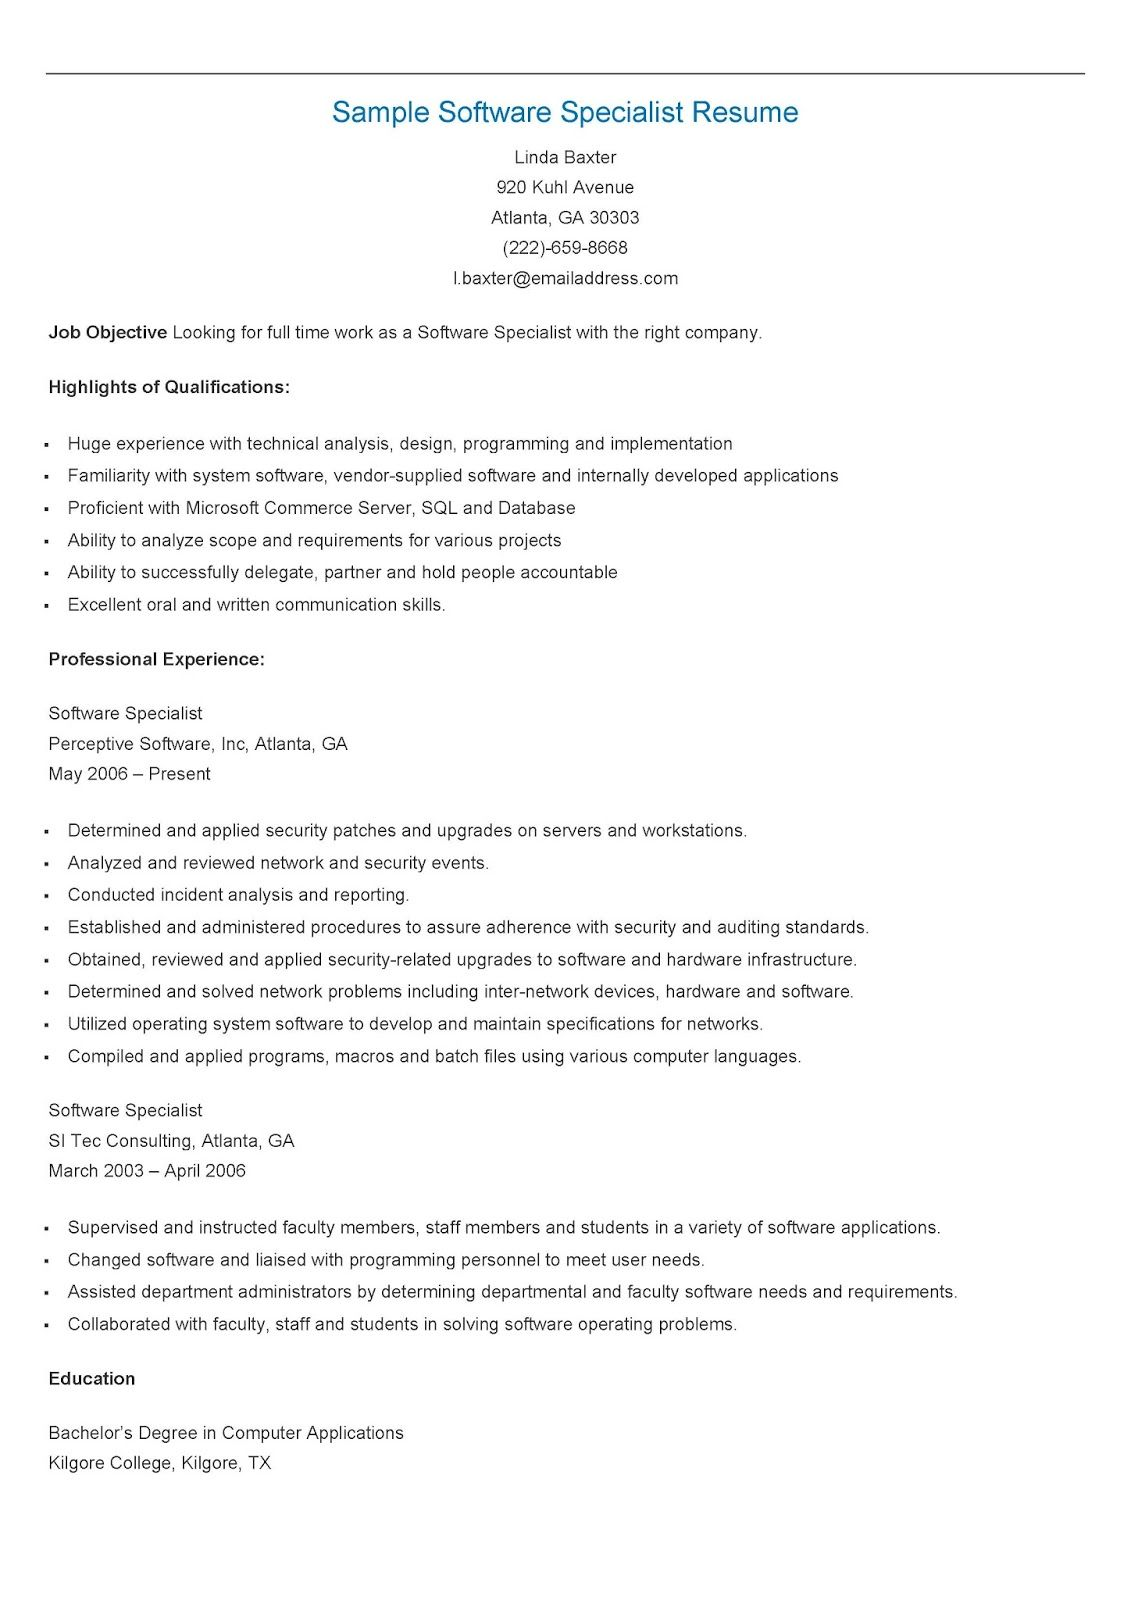 Sample Software Specialist Resume Resume Software Security Sample Resume